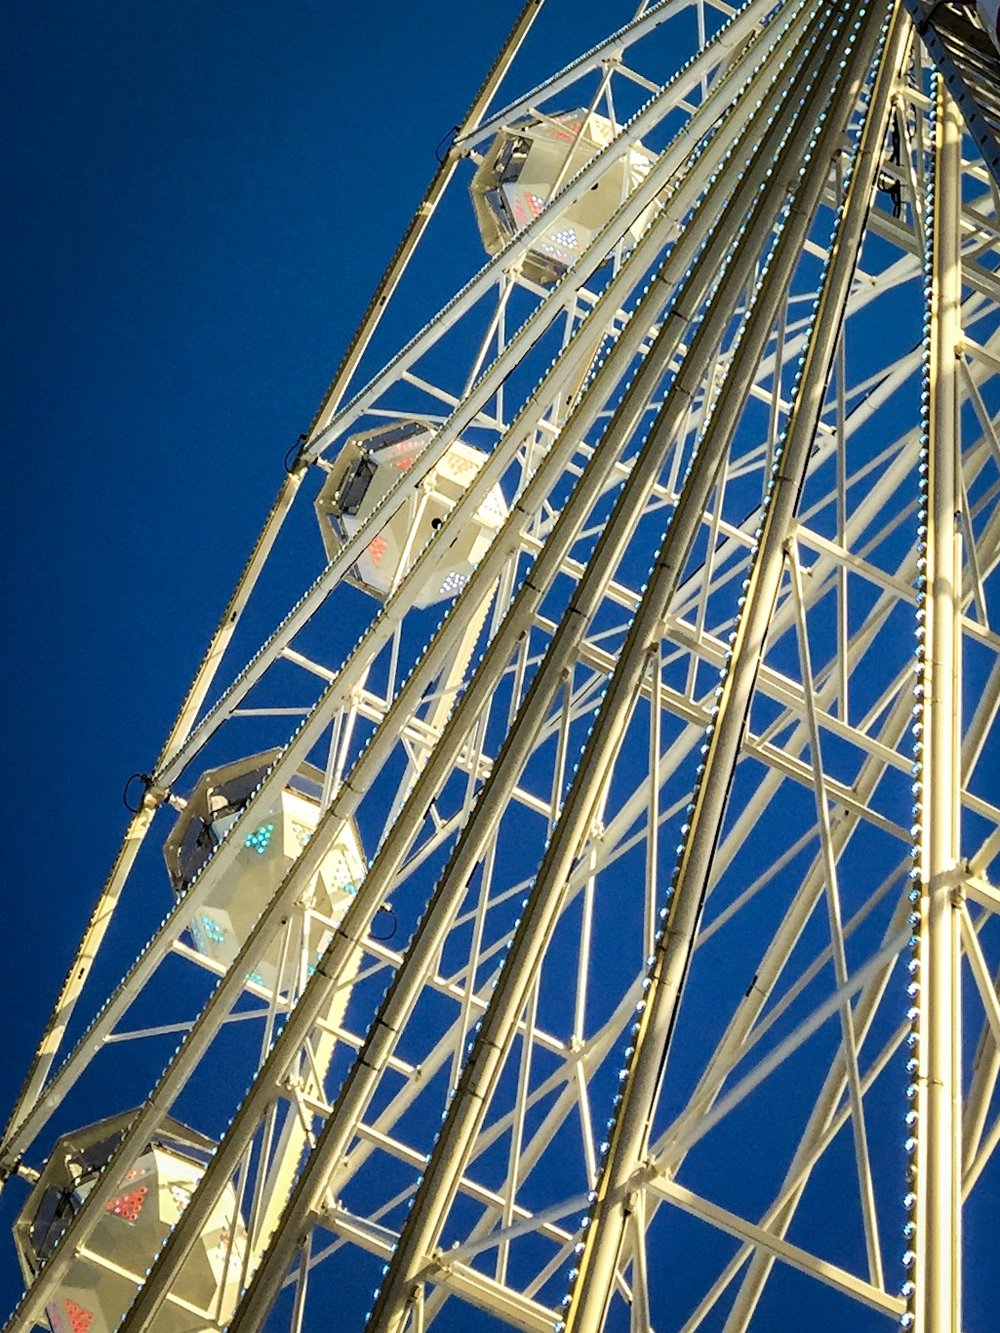 Ferris wheel by Rick McEvoy Bournemouth Photographer